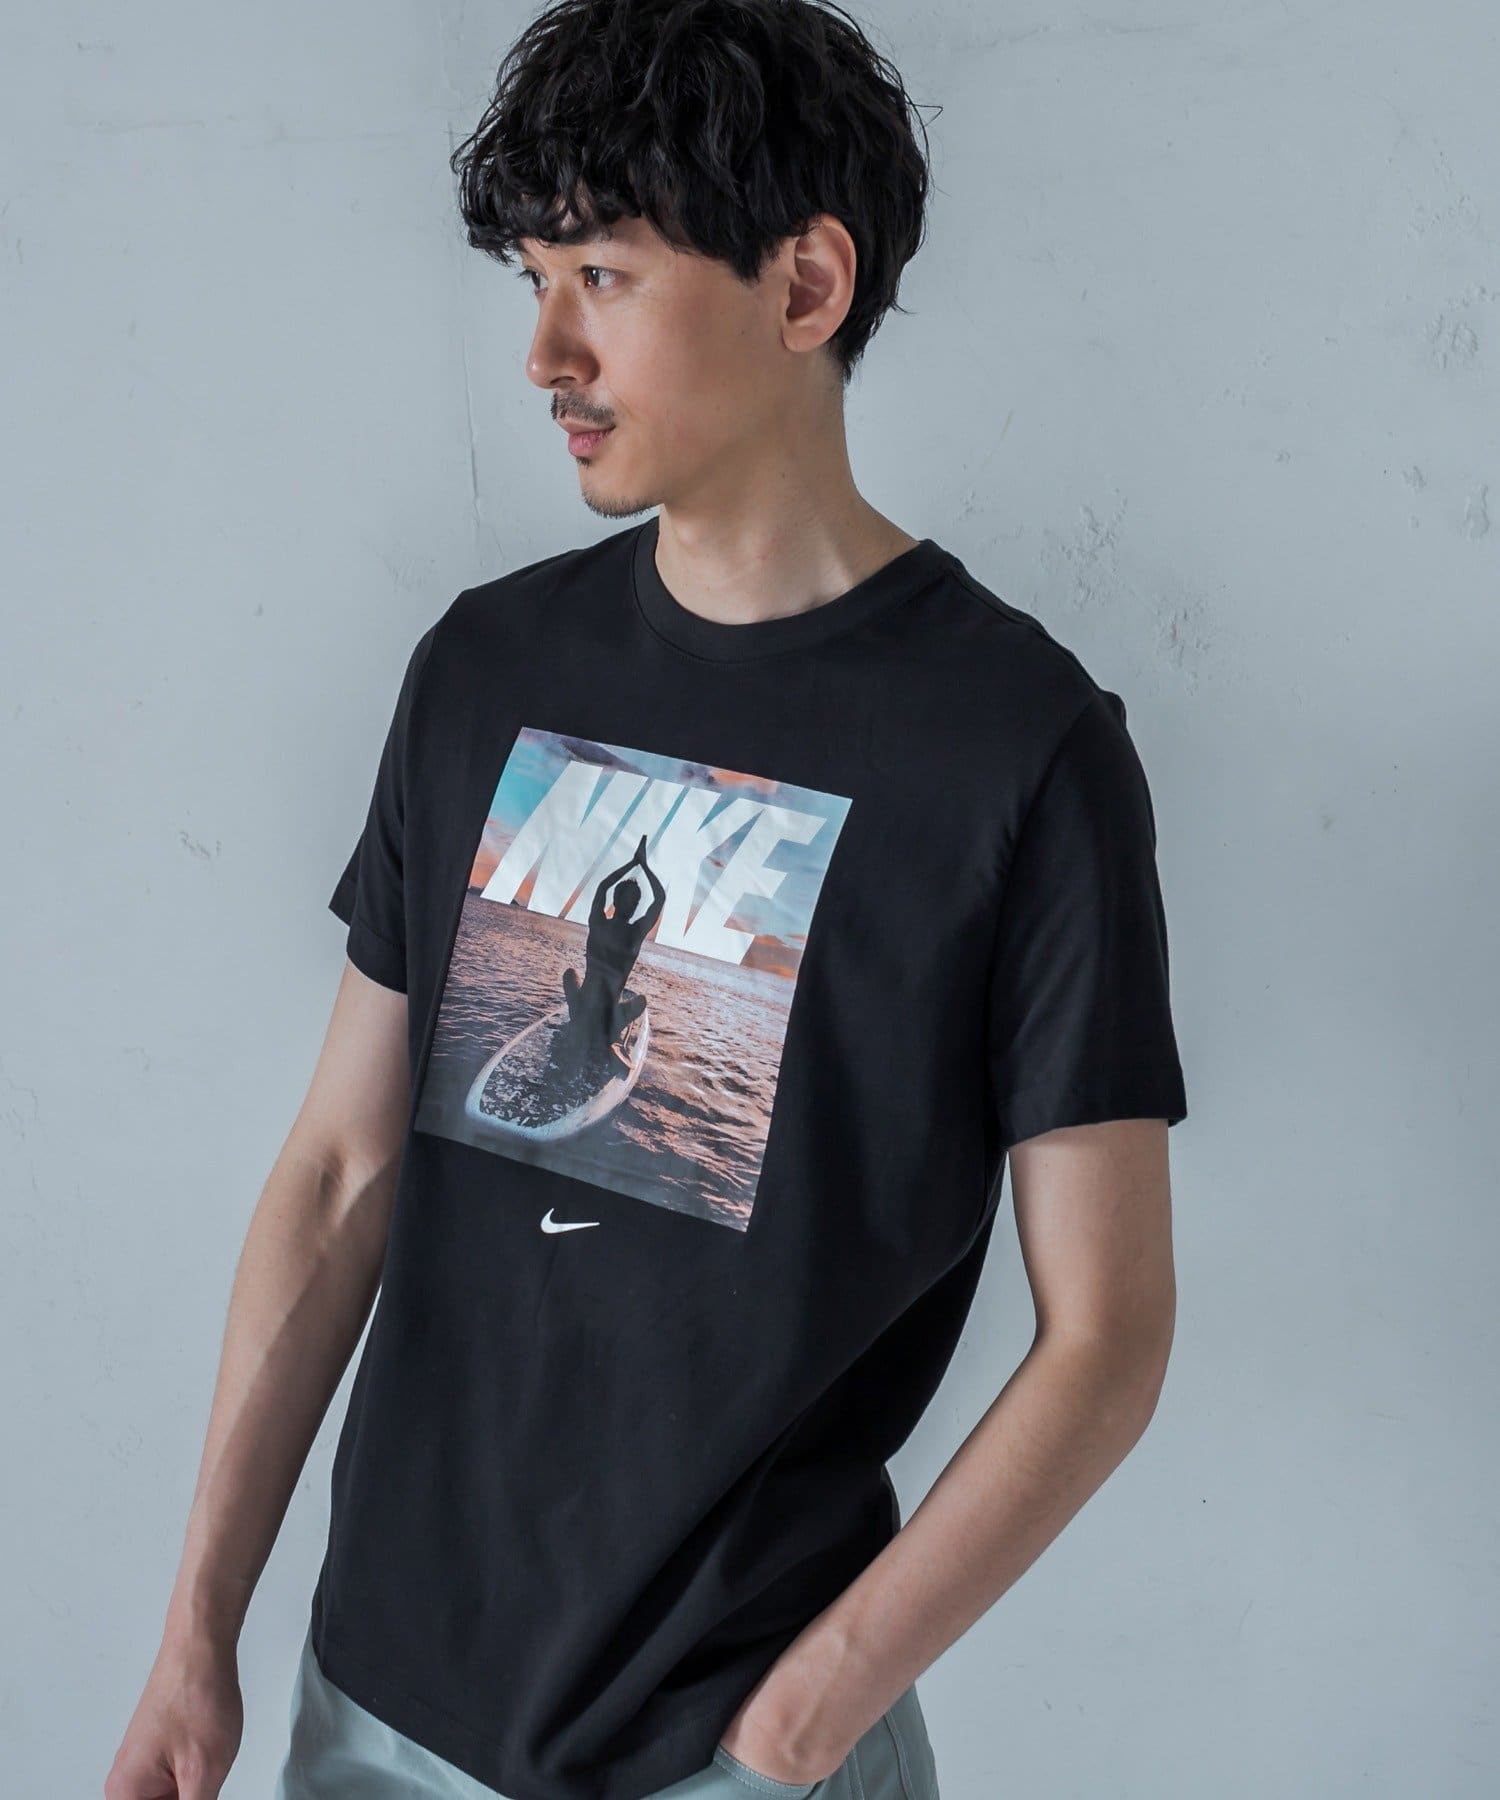 Discoat(ディスコート) 【NIKE/ナイキ】 DFC OC PHTO S/S Tシャツ